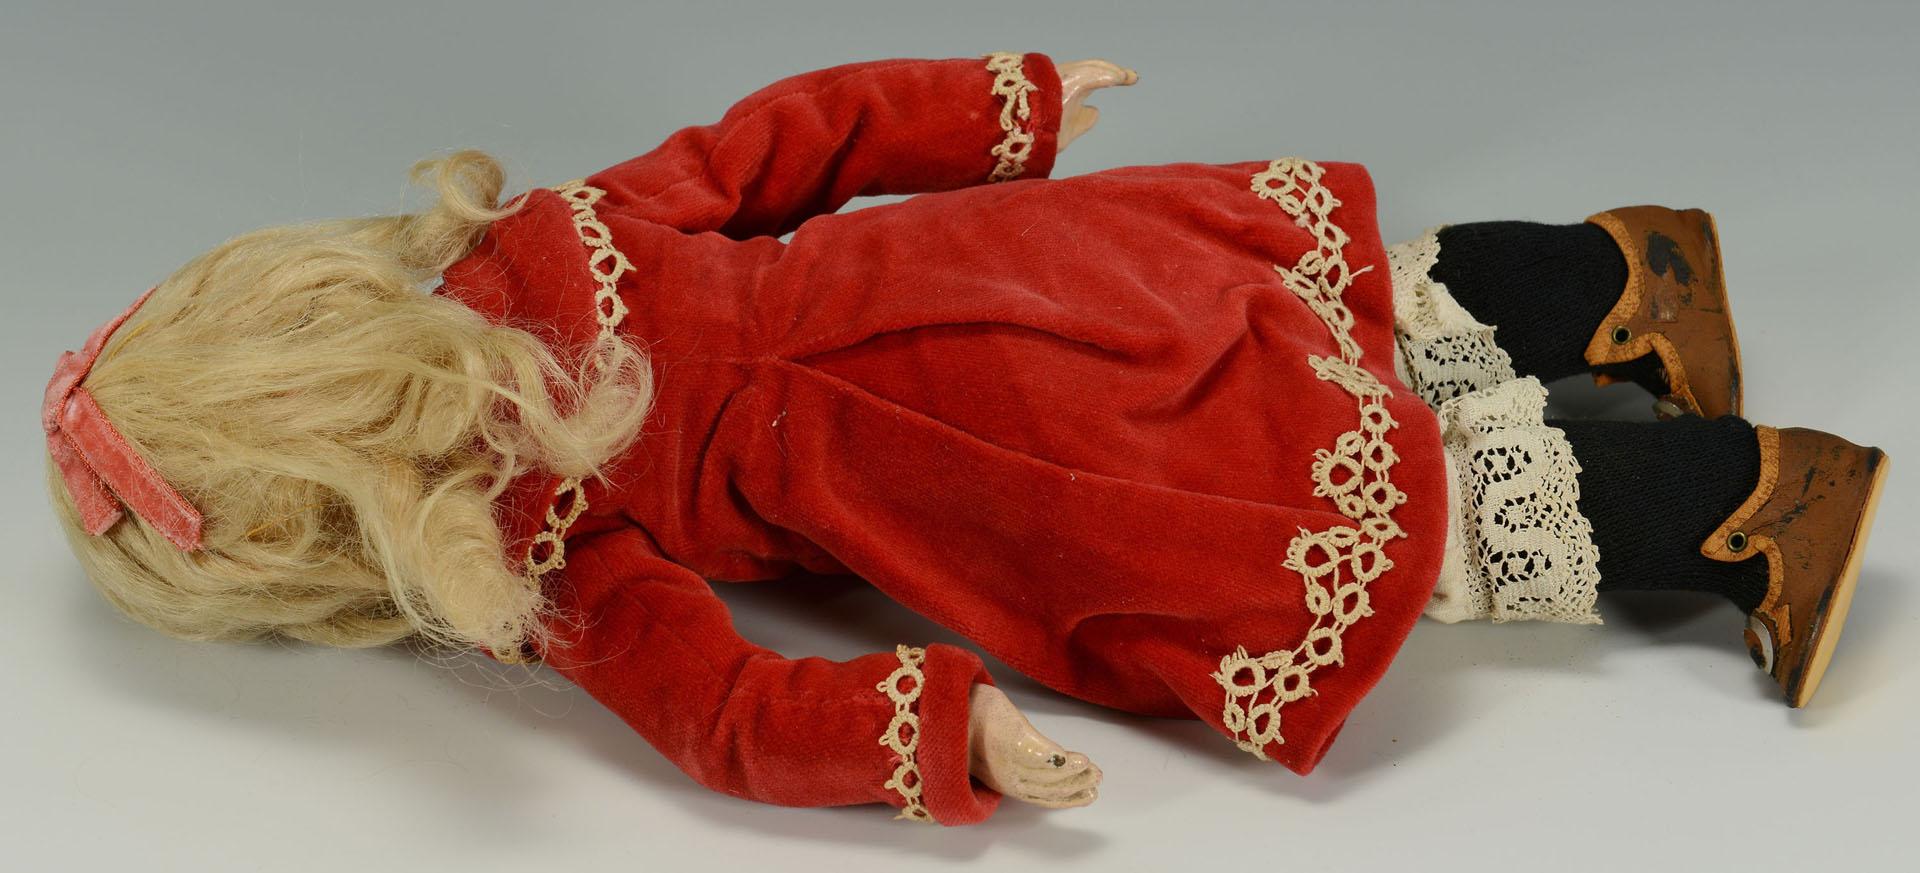 Depose Jumeau Bebe Doll in Petite Size